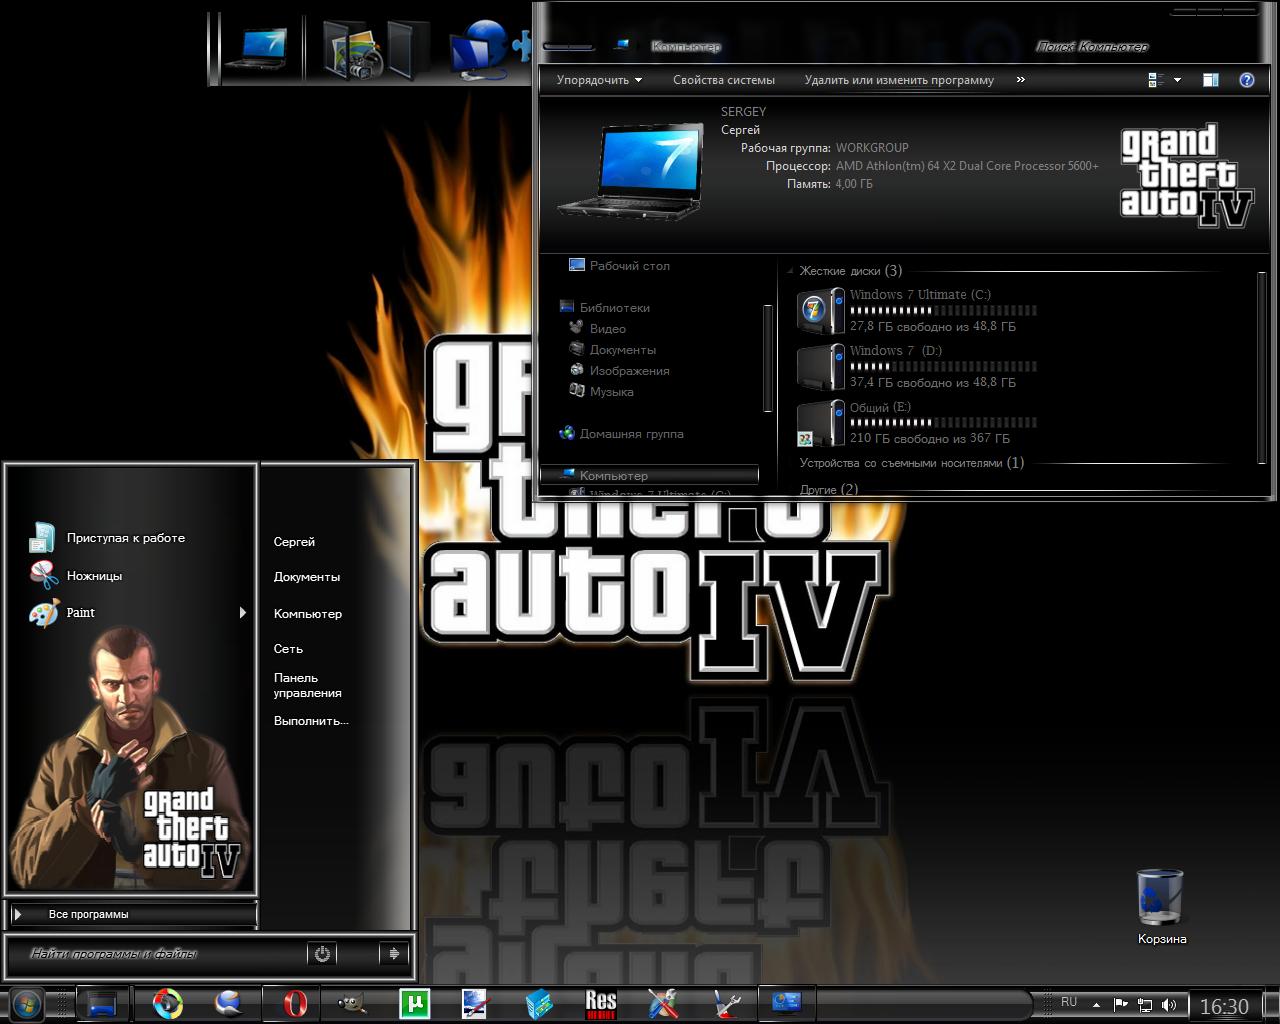 gta iv patch 1.0 7.0 crack razor 1911 rar download